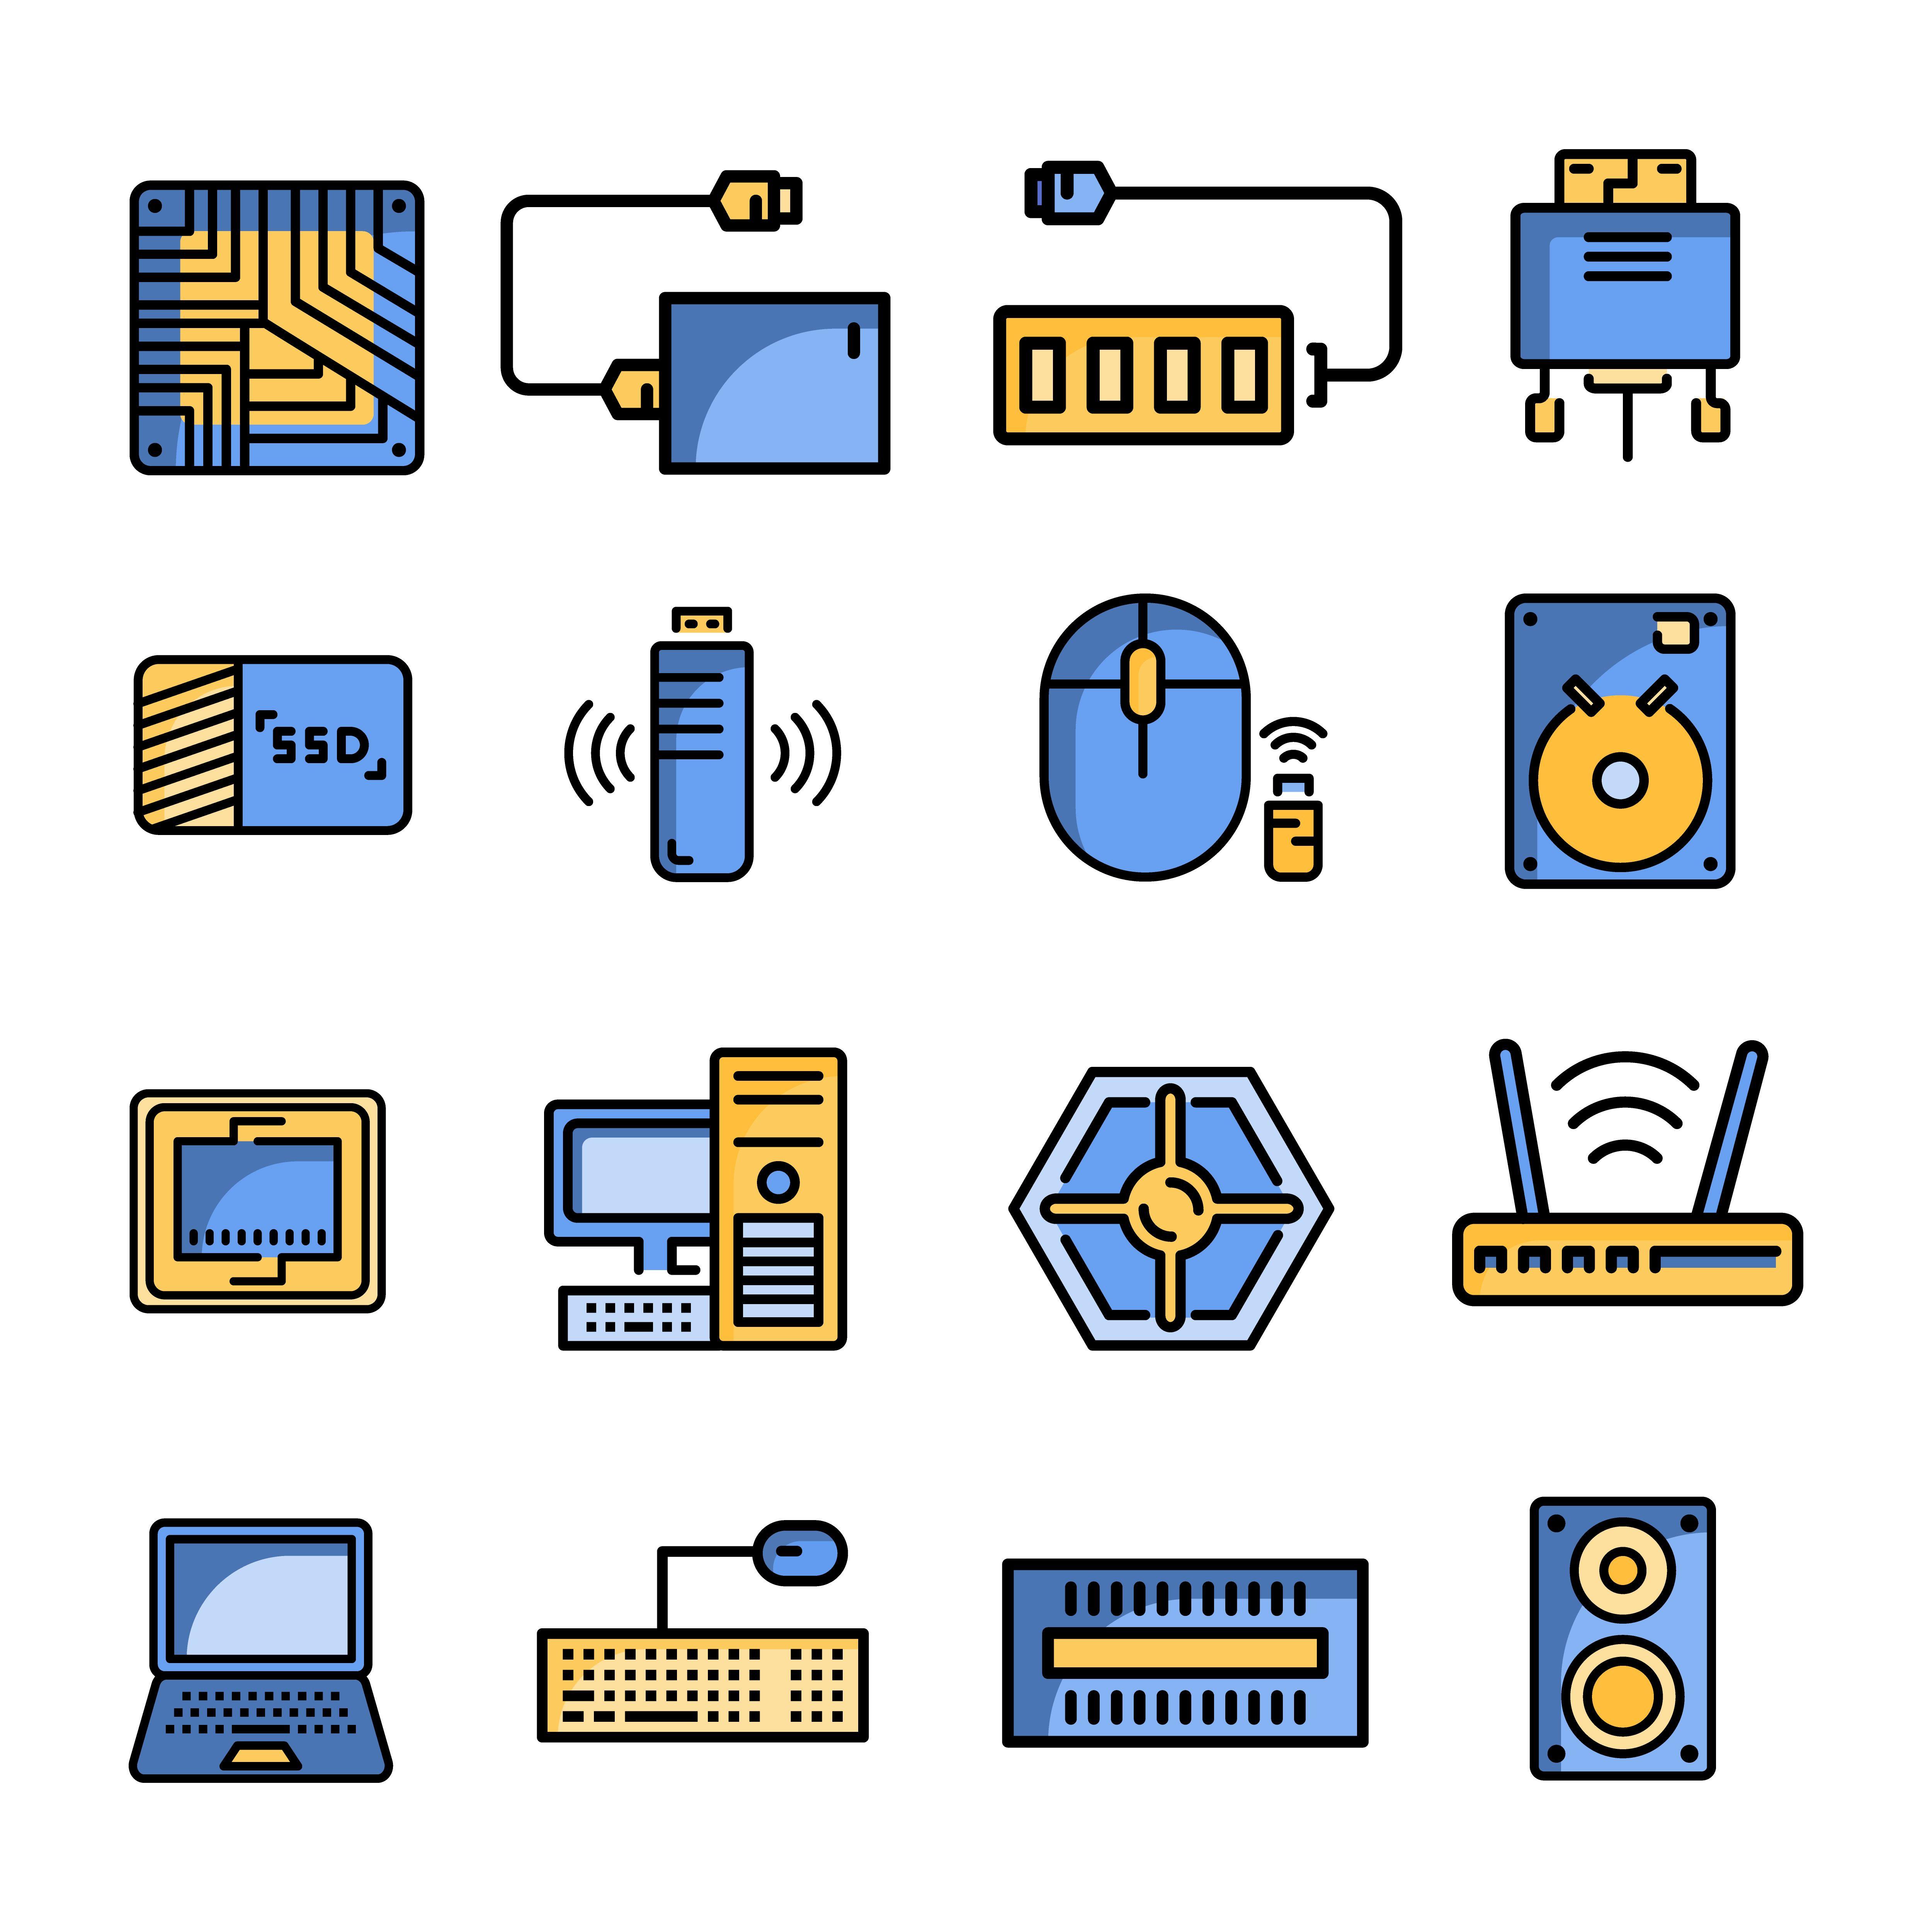 Technology Computer Hardware Design Accessories Tool Gadget